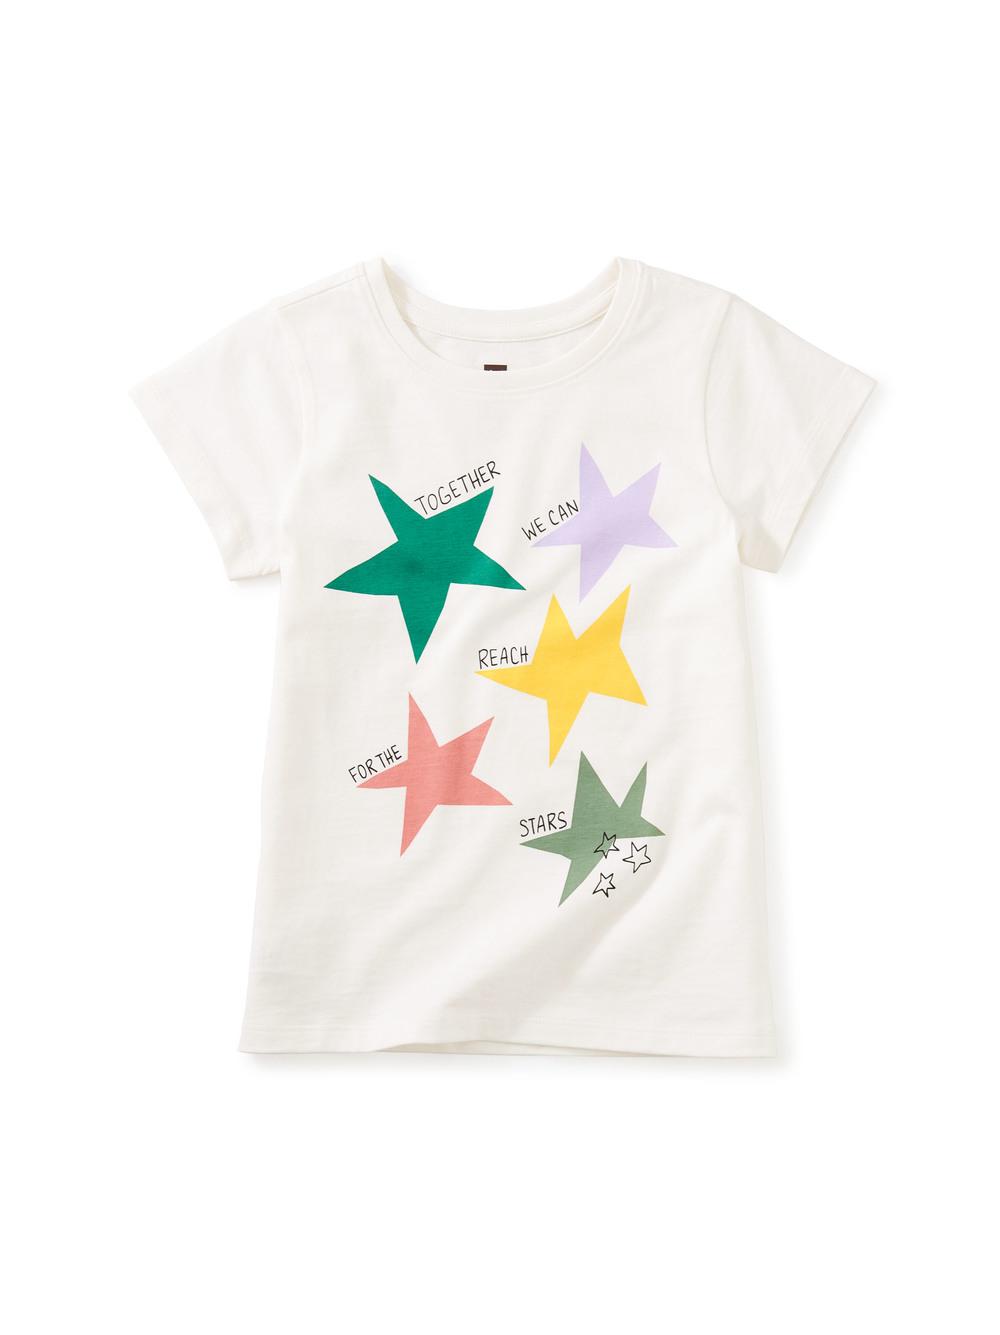 Reach for the Stars Tee